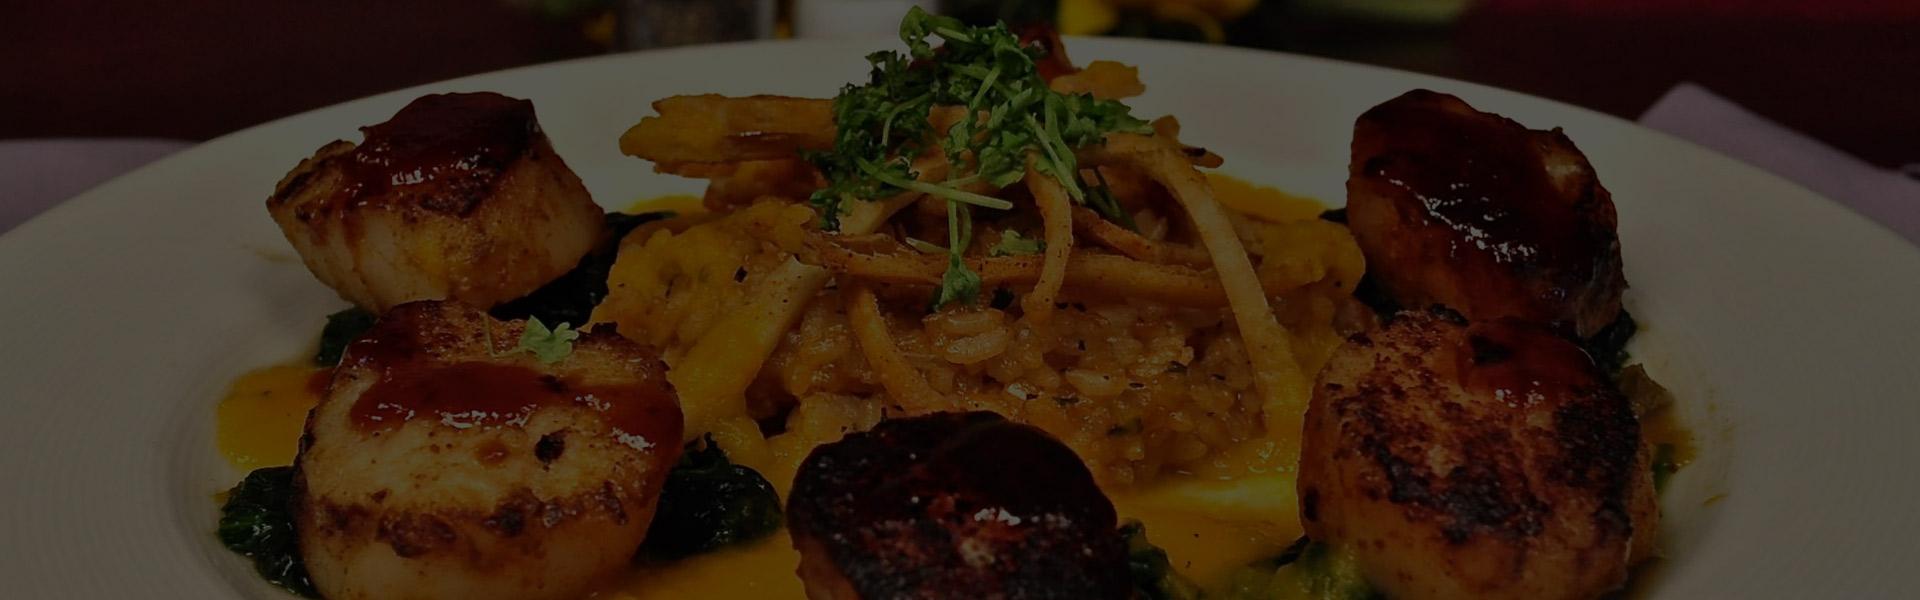 Dinner Menu - Steam Pub